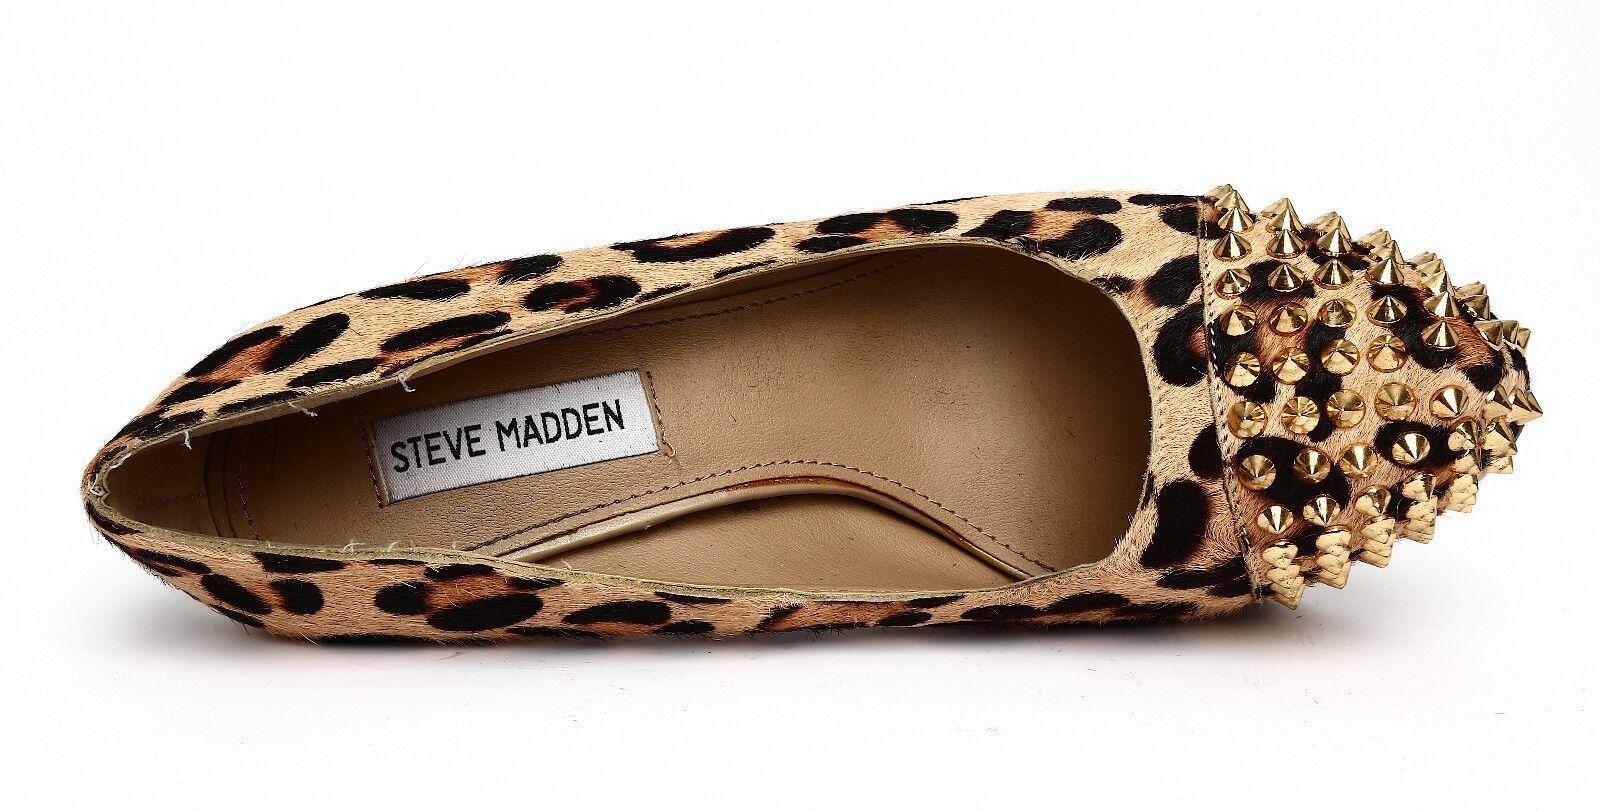 Steve Madden Bolddd Gold Cheetah Print Gold Bolddd Stud Platform Pumps Sz 8.5M 4448 d13b5e